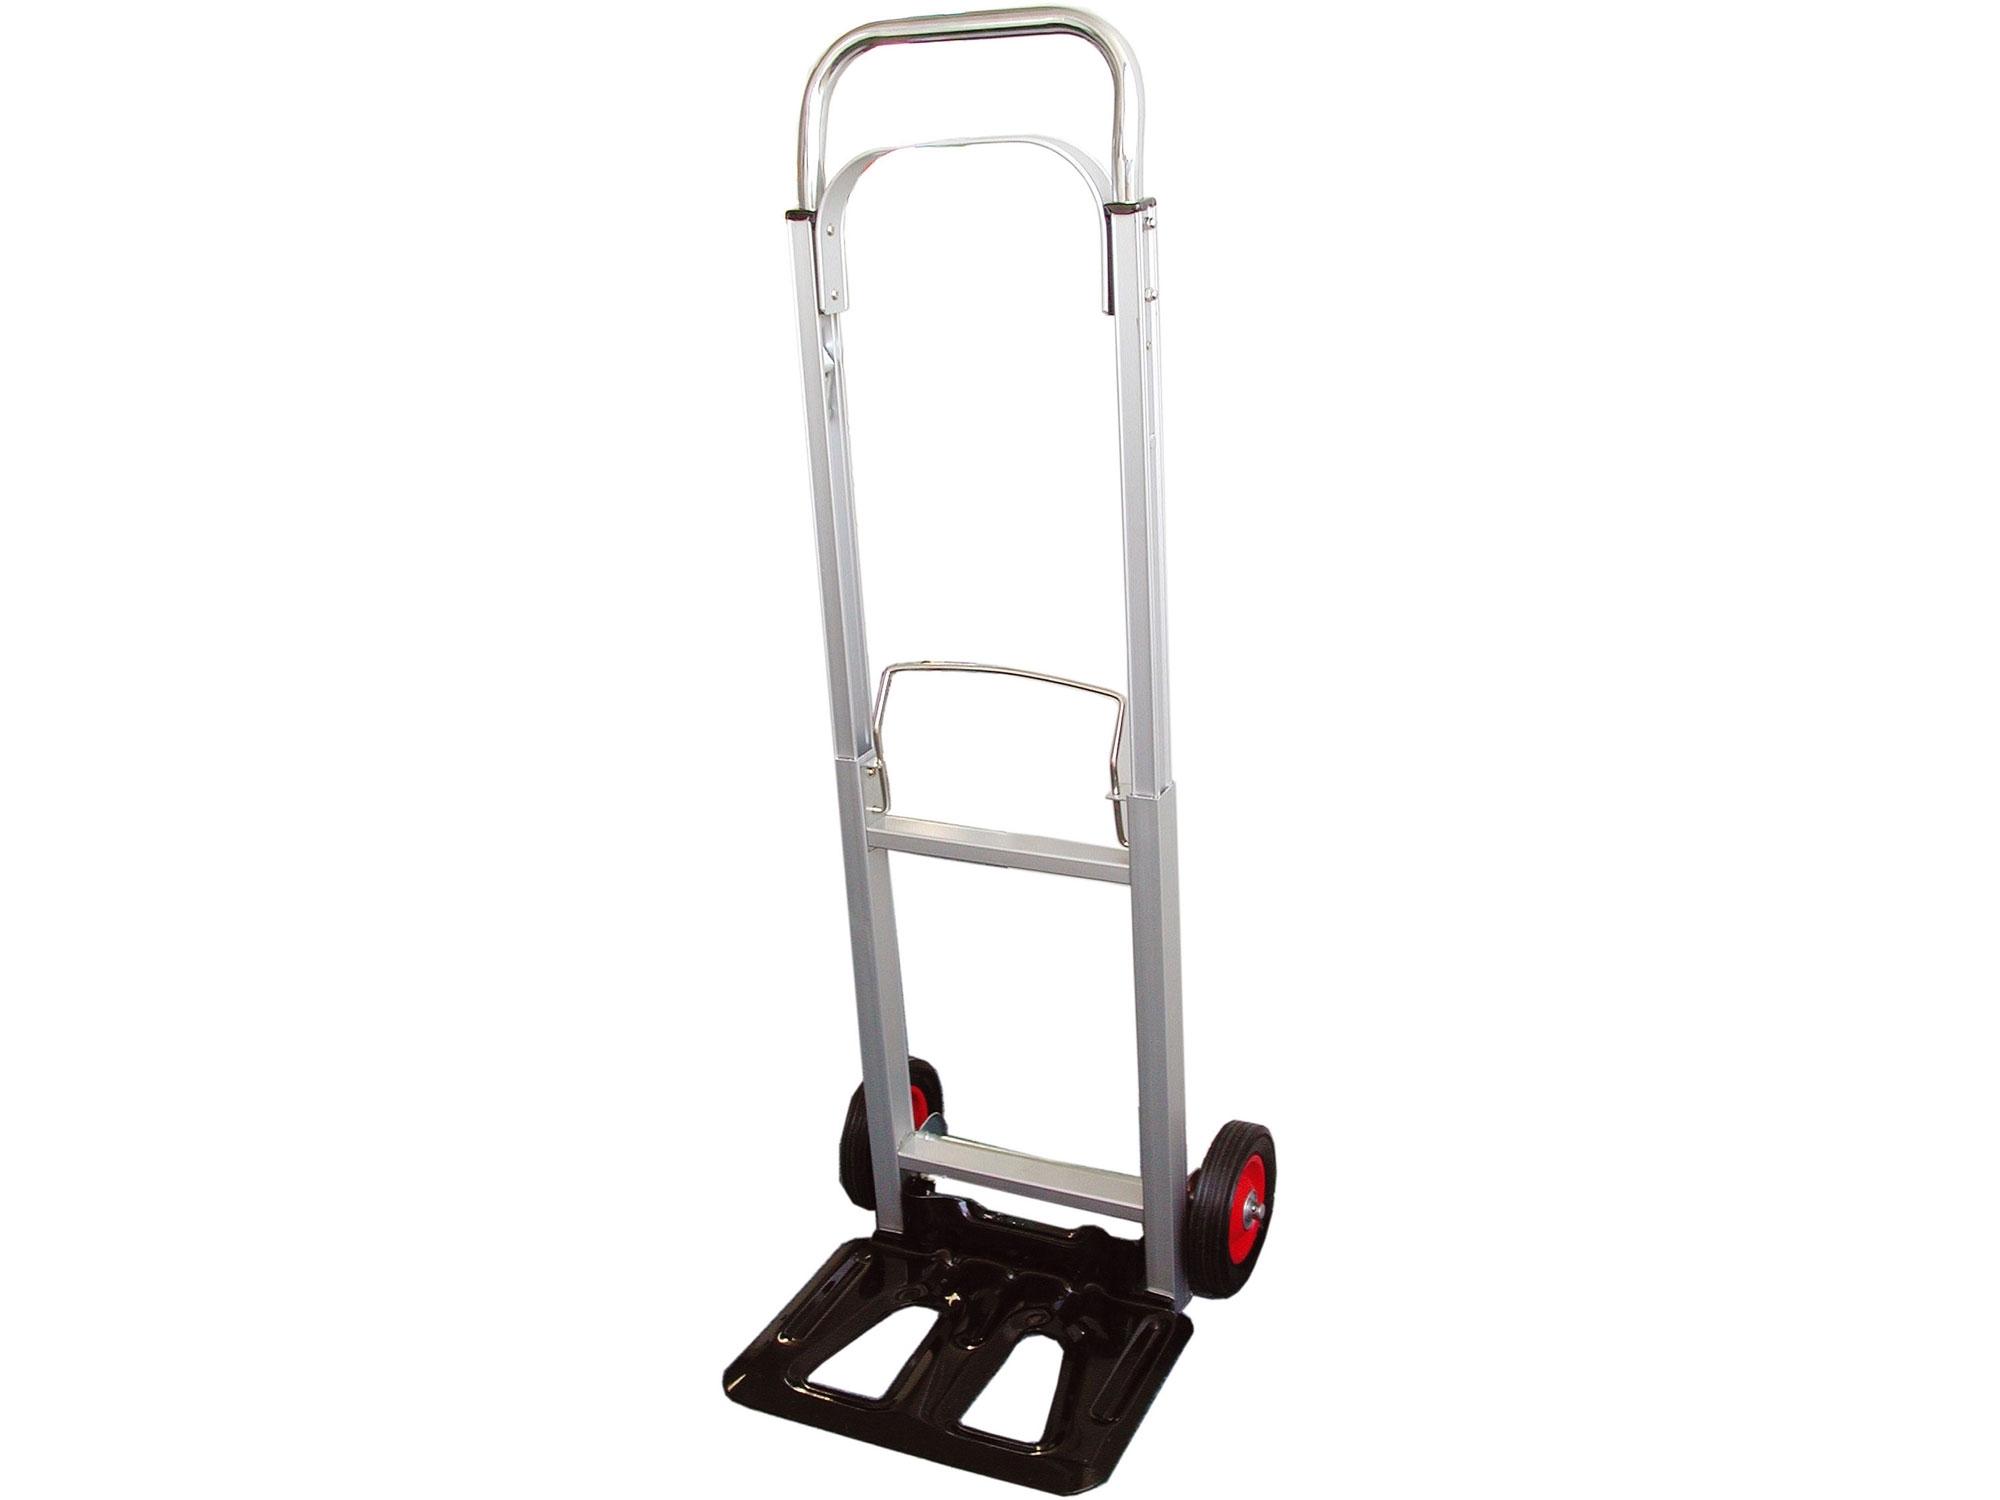 vozík-rudl skládací, EXTOL CRAFT 9987